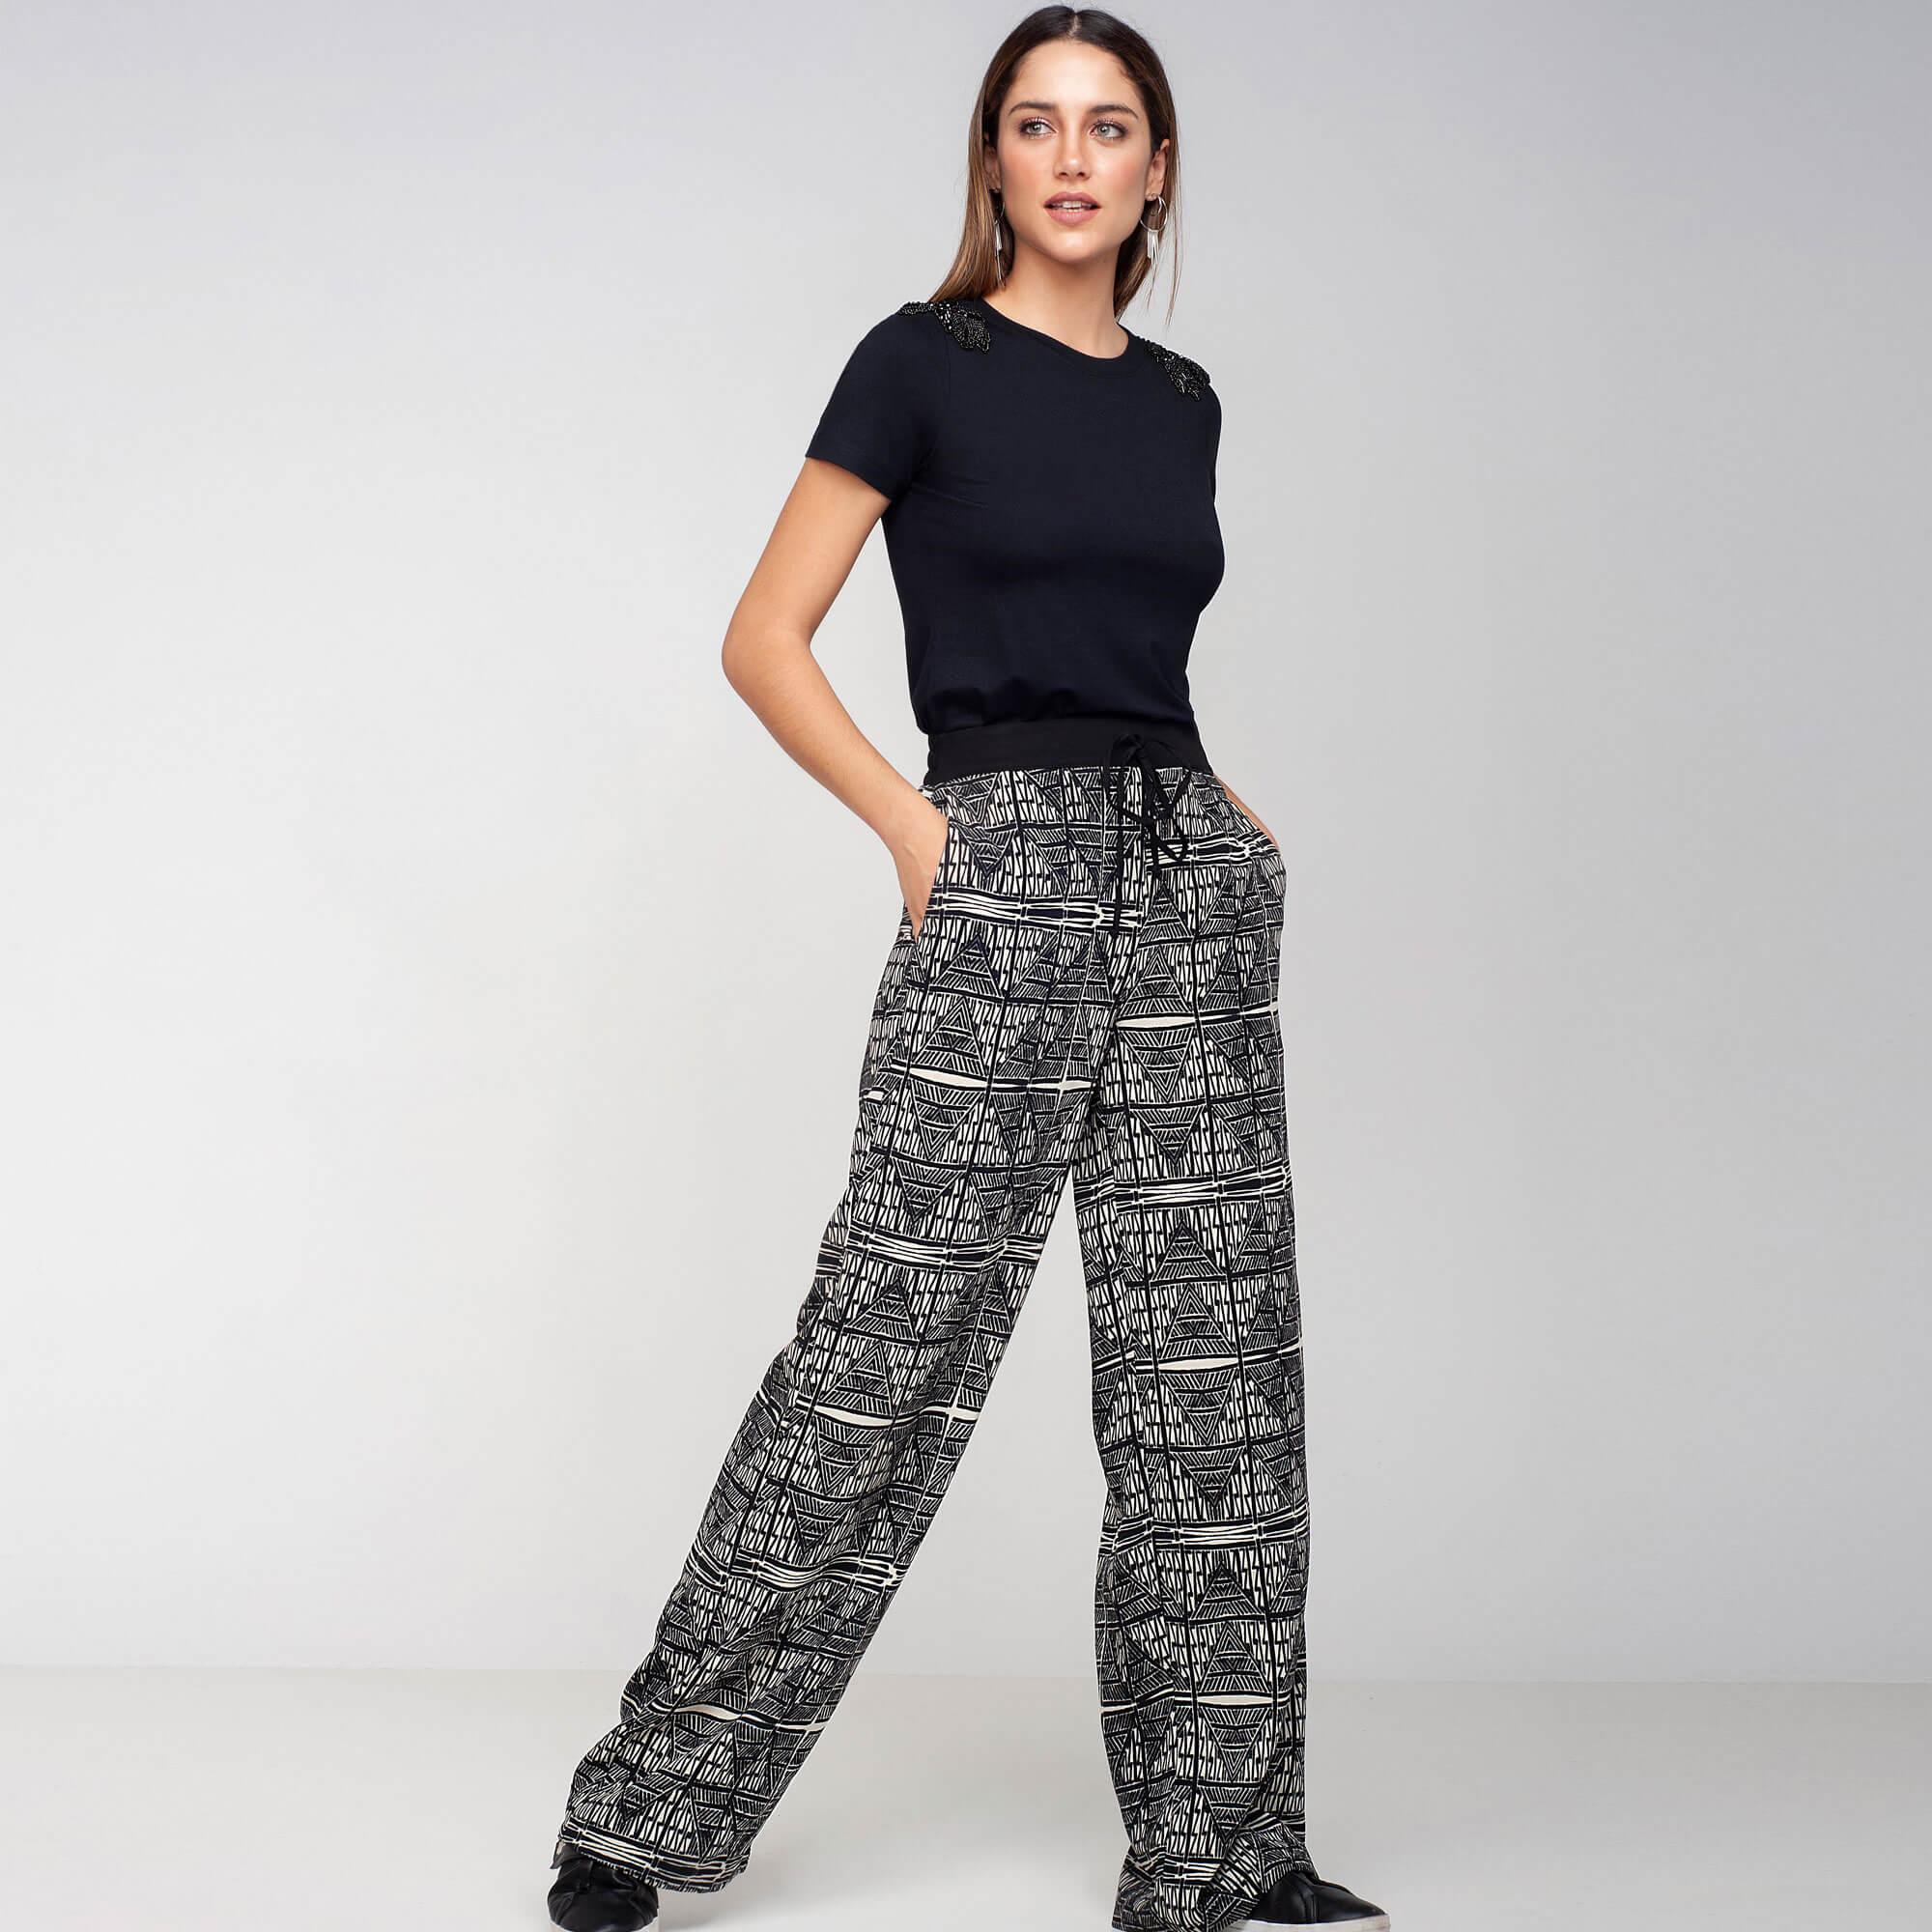 Pantalona crepe geométrico